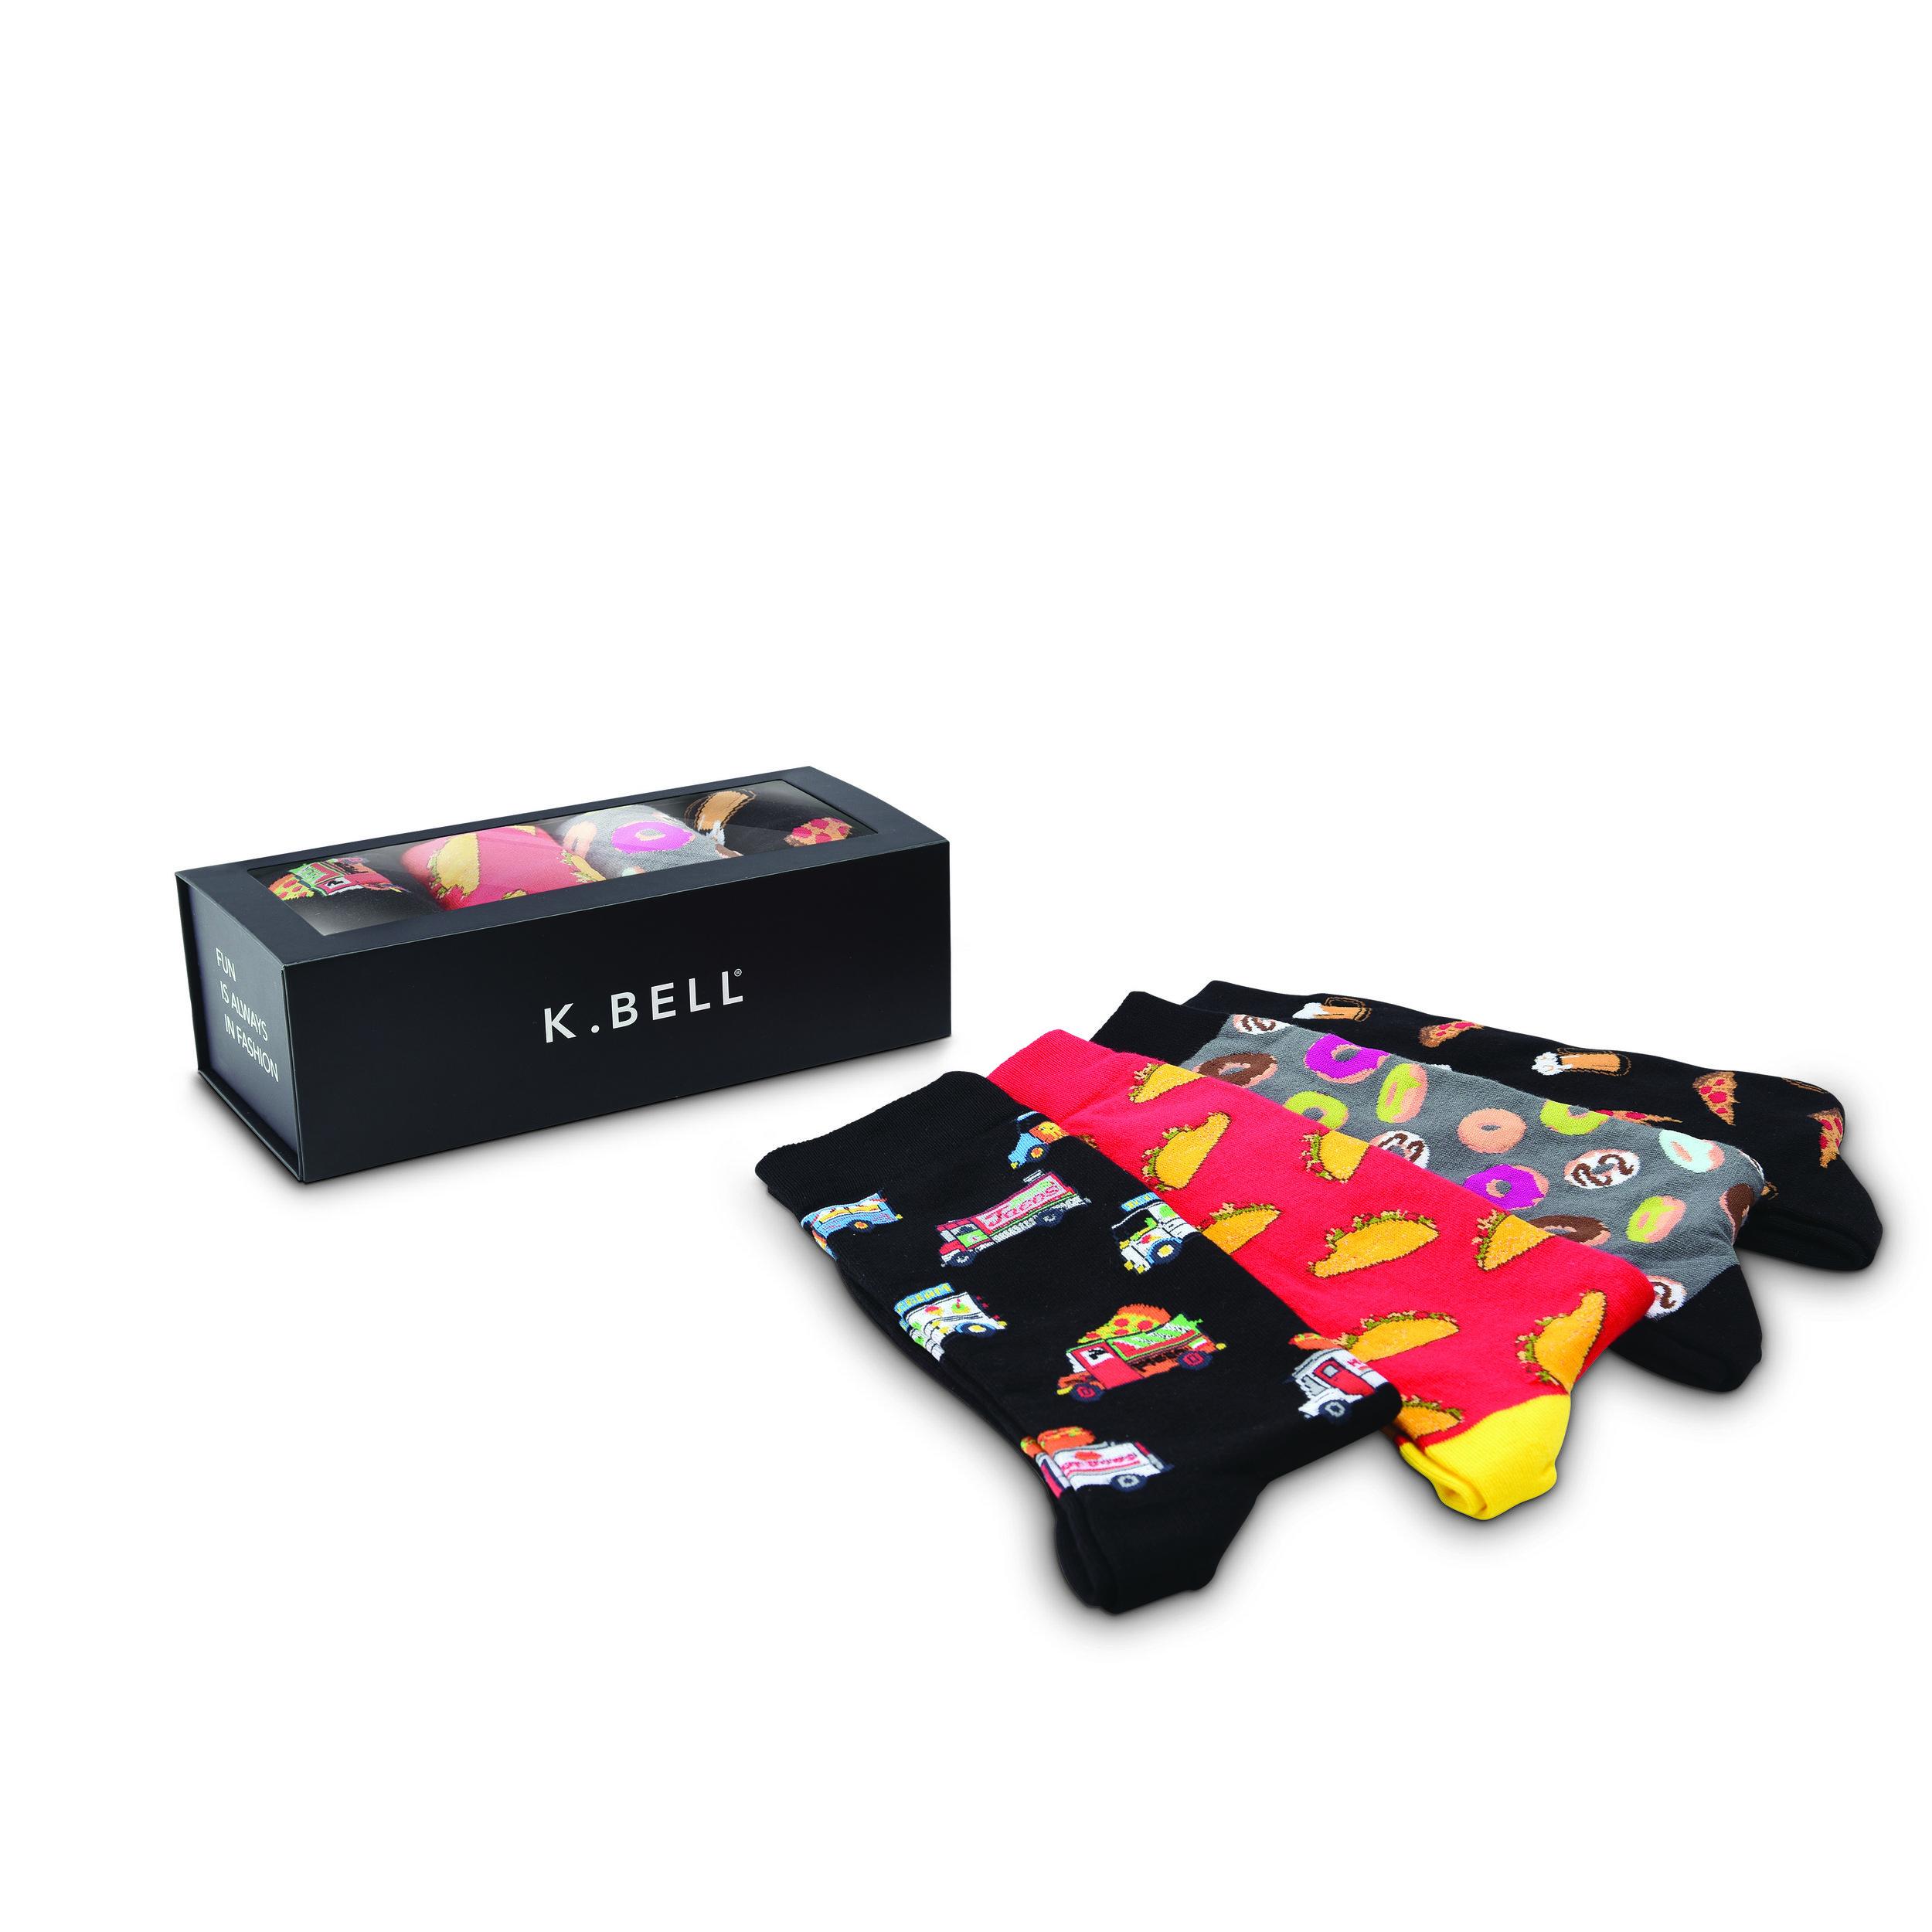 Black Label Gift Box M 1 CLOSED.jpg